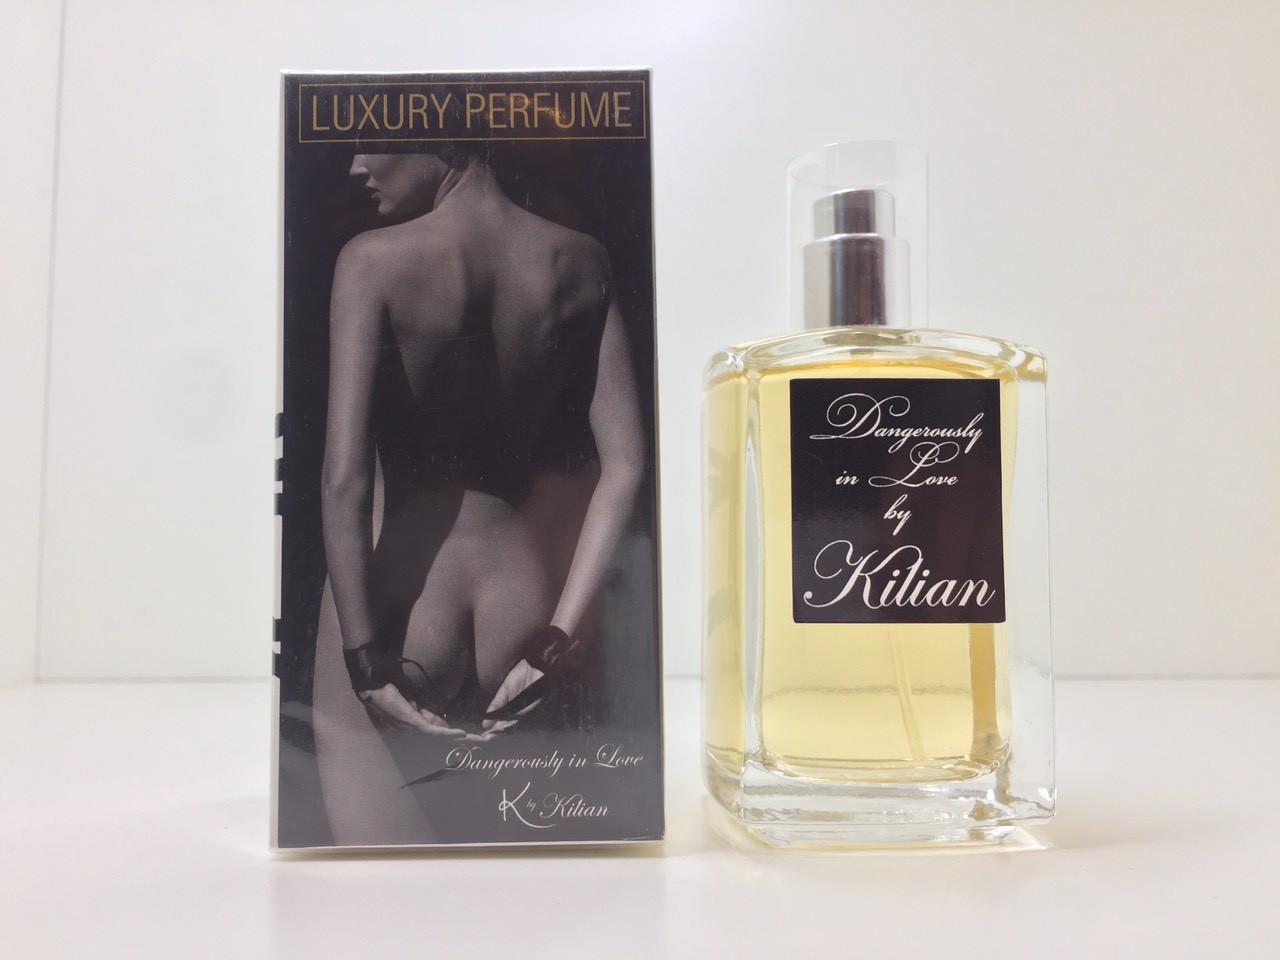 Парфюмированная вода унисекс Luxury parfume Kilian Dangerously in Love (Денжерос ин лав)